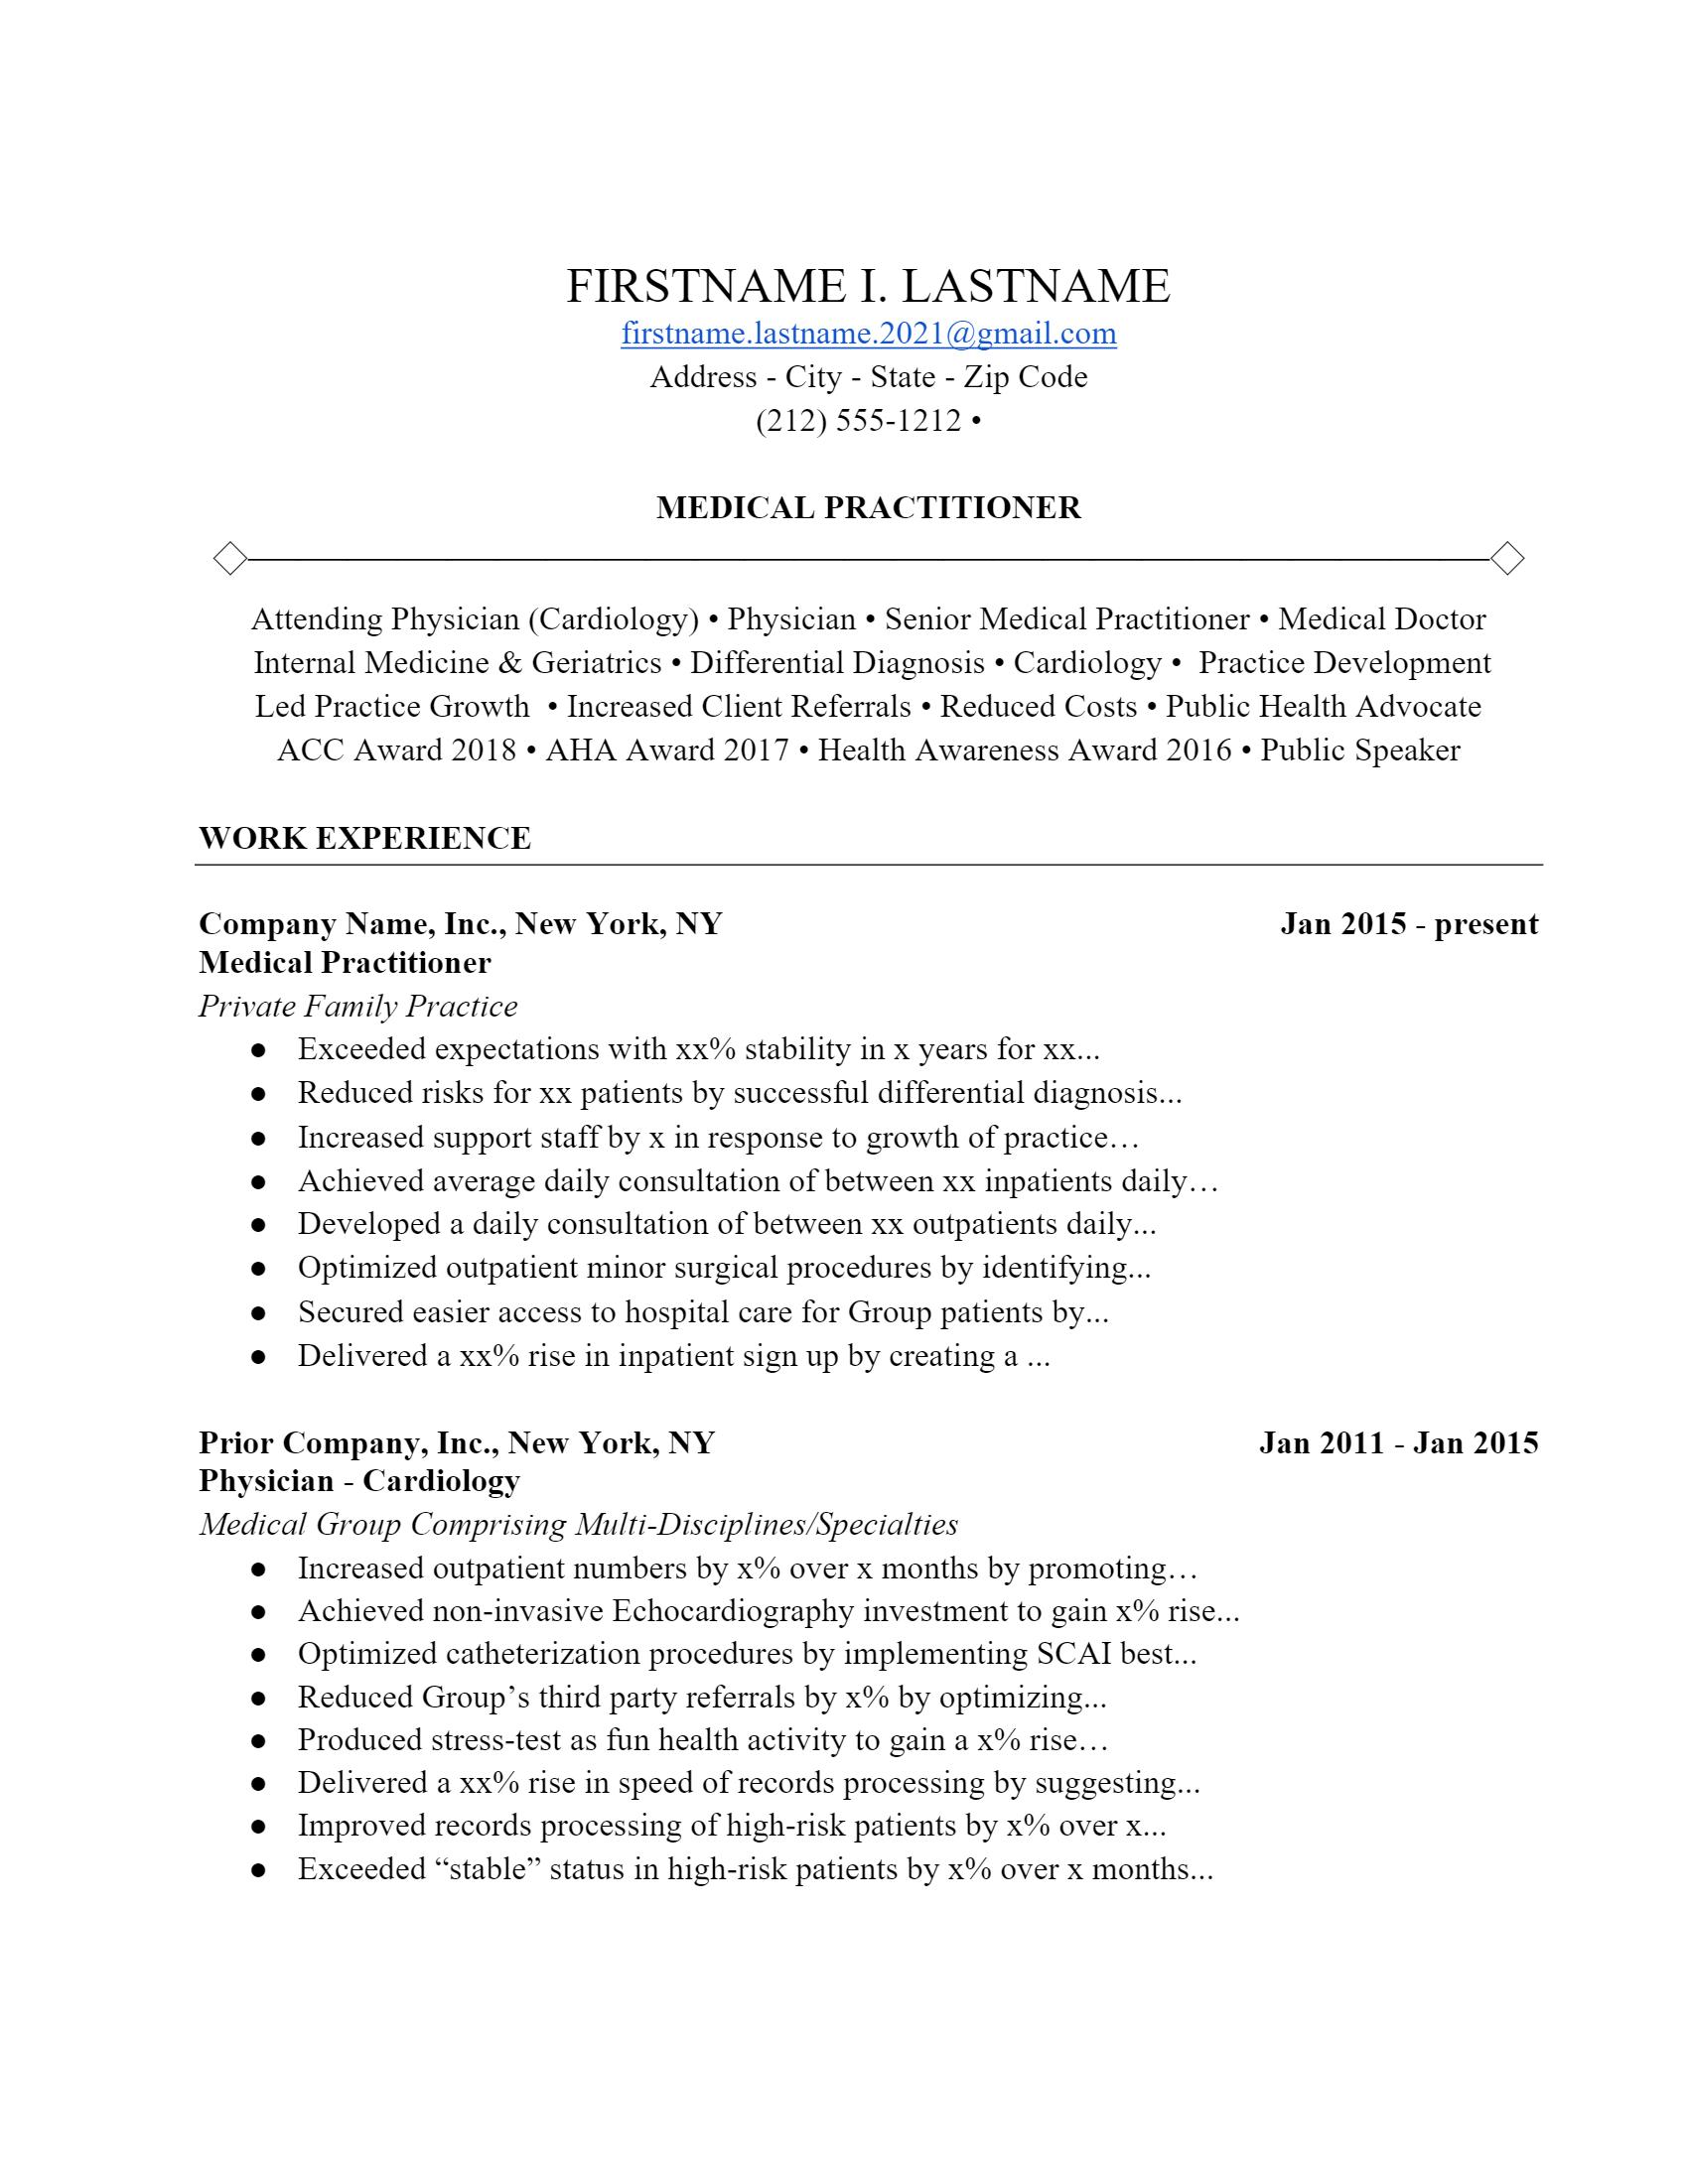 Medical Practitioner Resume .Docx (Word)